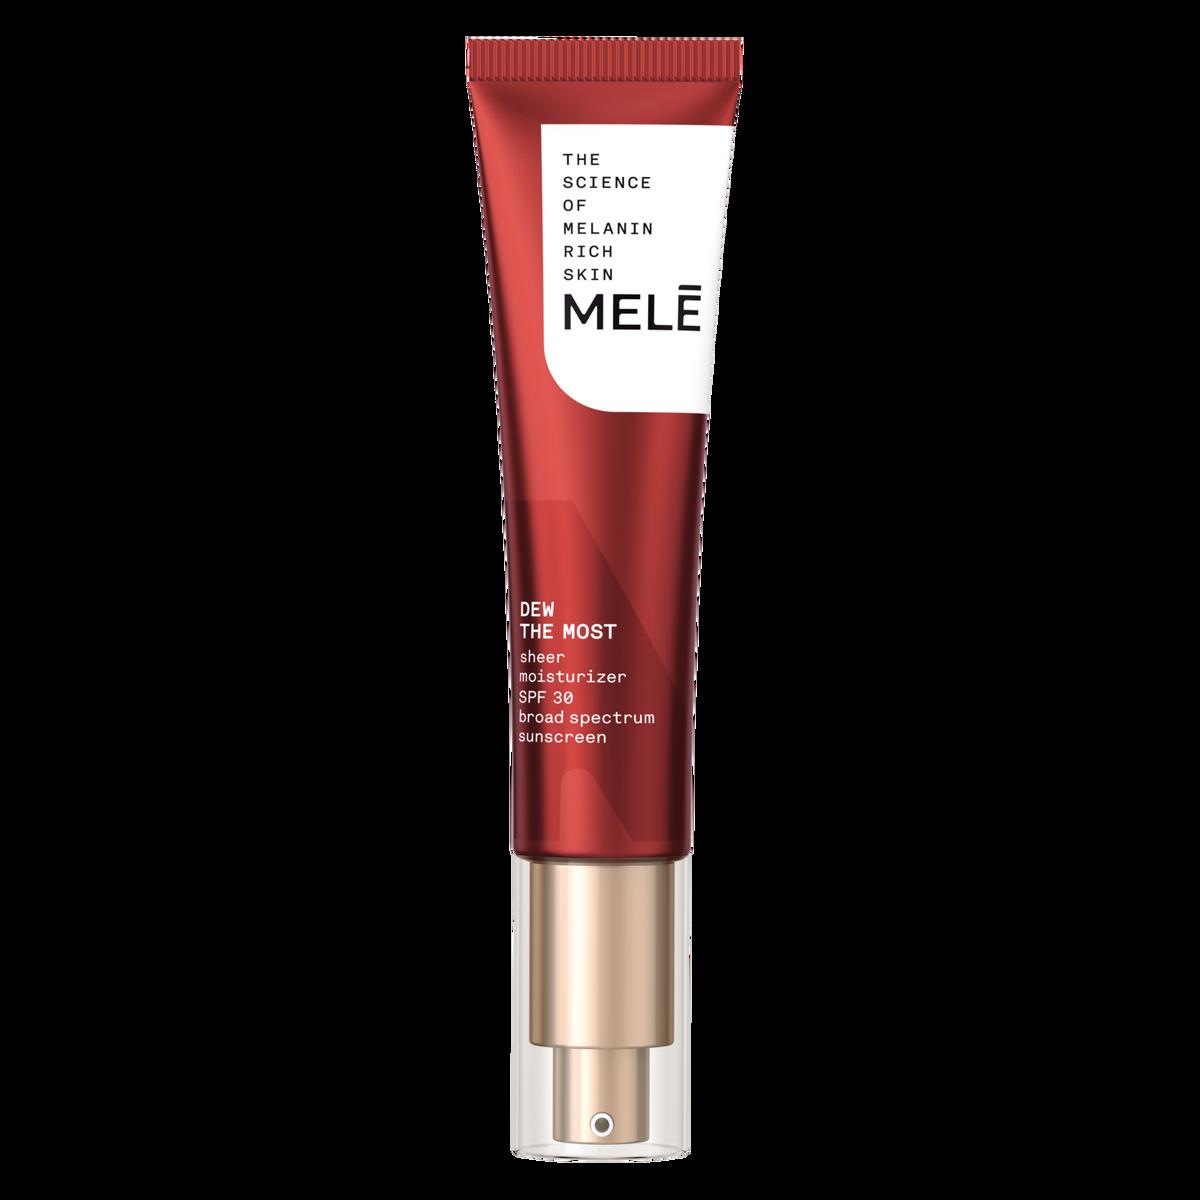 mele Dew the most sheer moisturizer spf 30